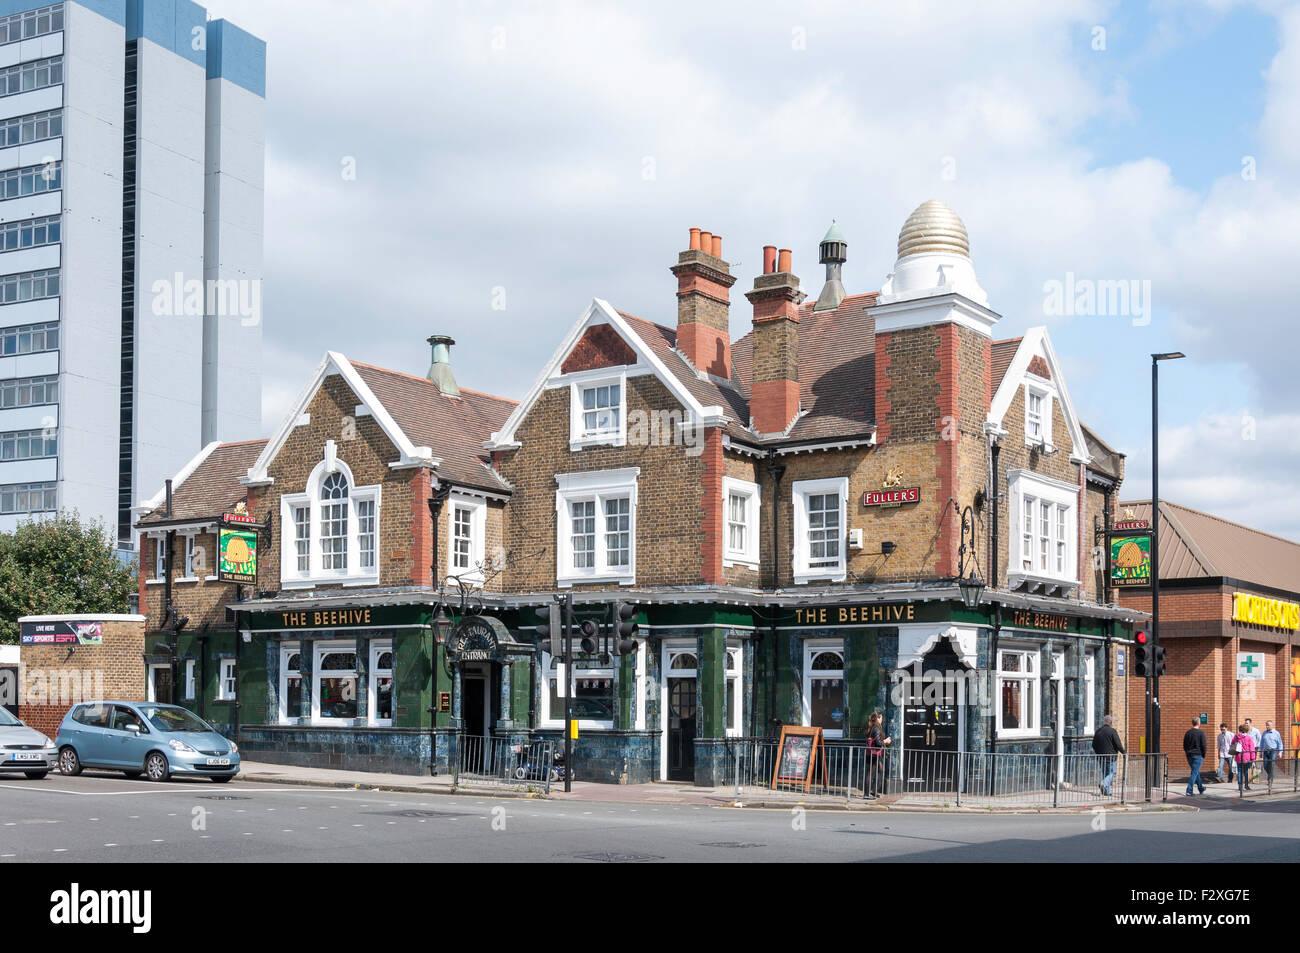 The Beehive Pub, High Street, Brentford, London Borough of Hounslow, Greater London, England, United Kingdom - Stock Image